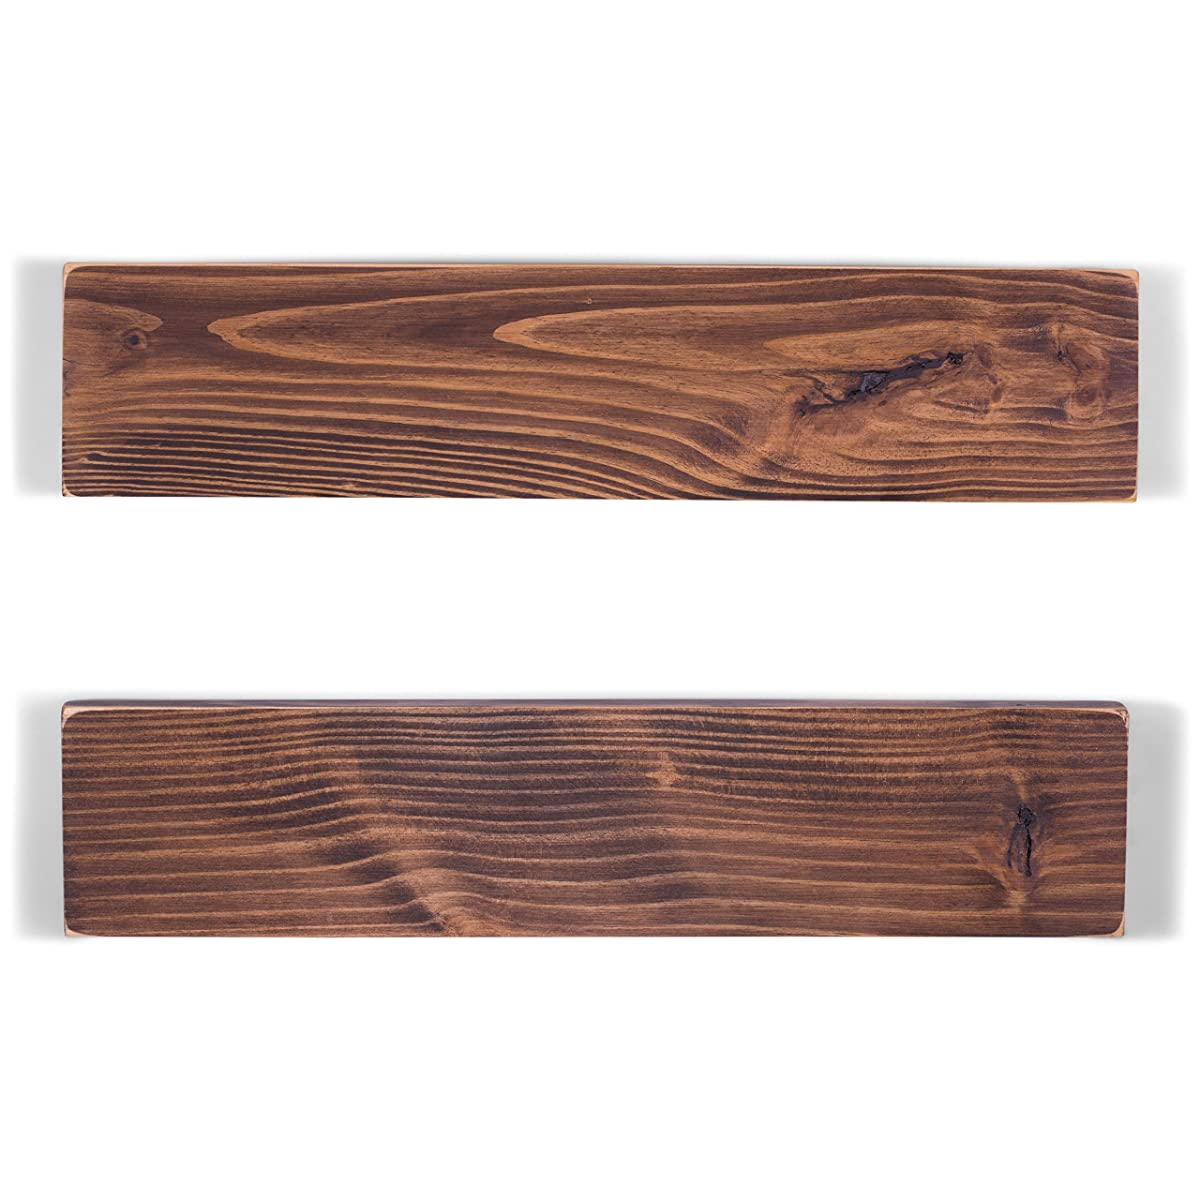 "DAKODA LOVE Weathered Edge Floating Shelves, USA Handmade, Clear Coat Finish, 100% Countersunk Hidden Floating Shelf Brackets, Beautiful Grain Pine Wood Rustic Wall Decor (Set of 2) (24"", Espresso)"